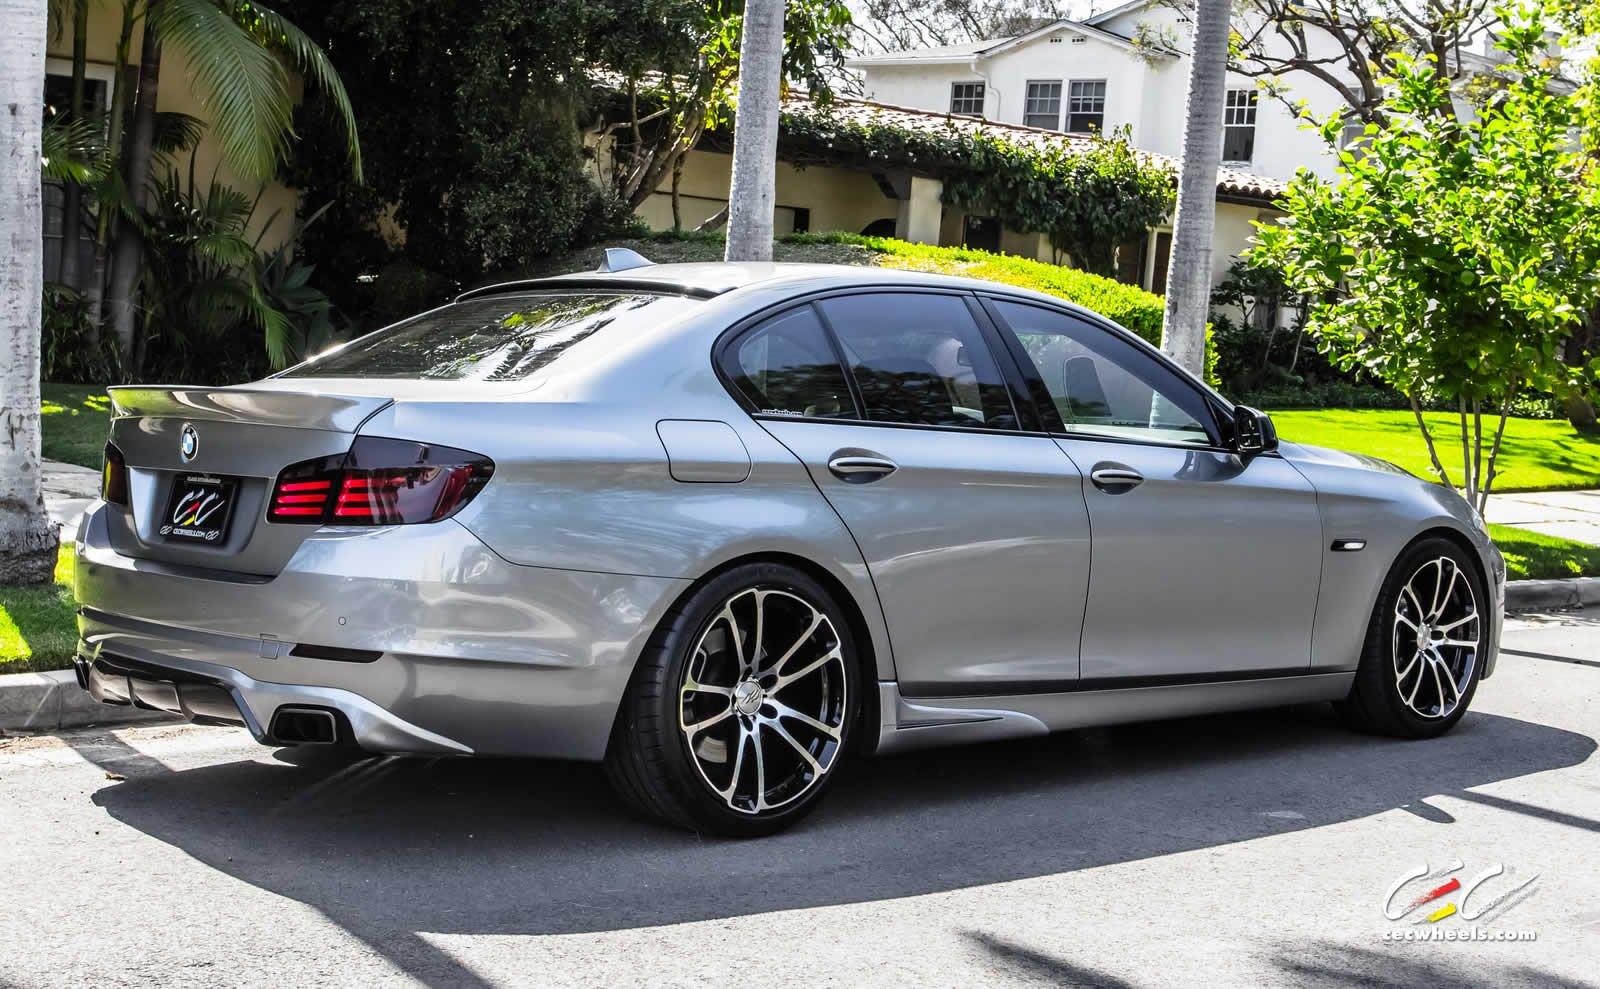 2015 cars CEC Tuning wheels BMW 535i wallpaper | 1600x989 ...